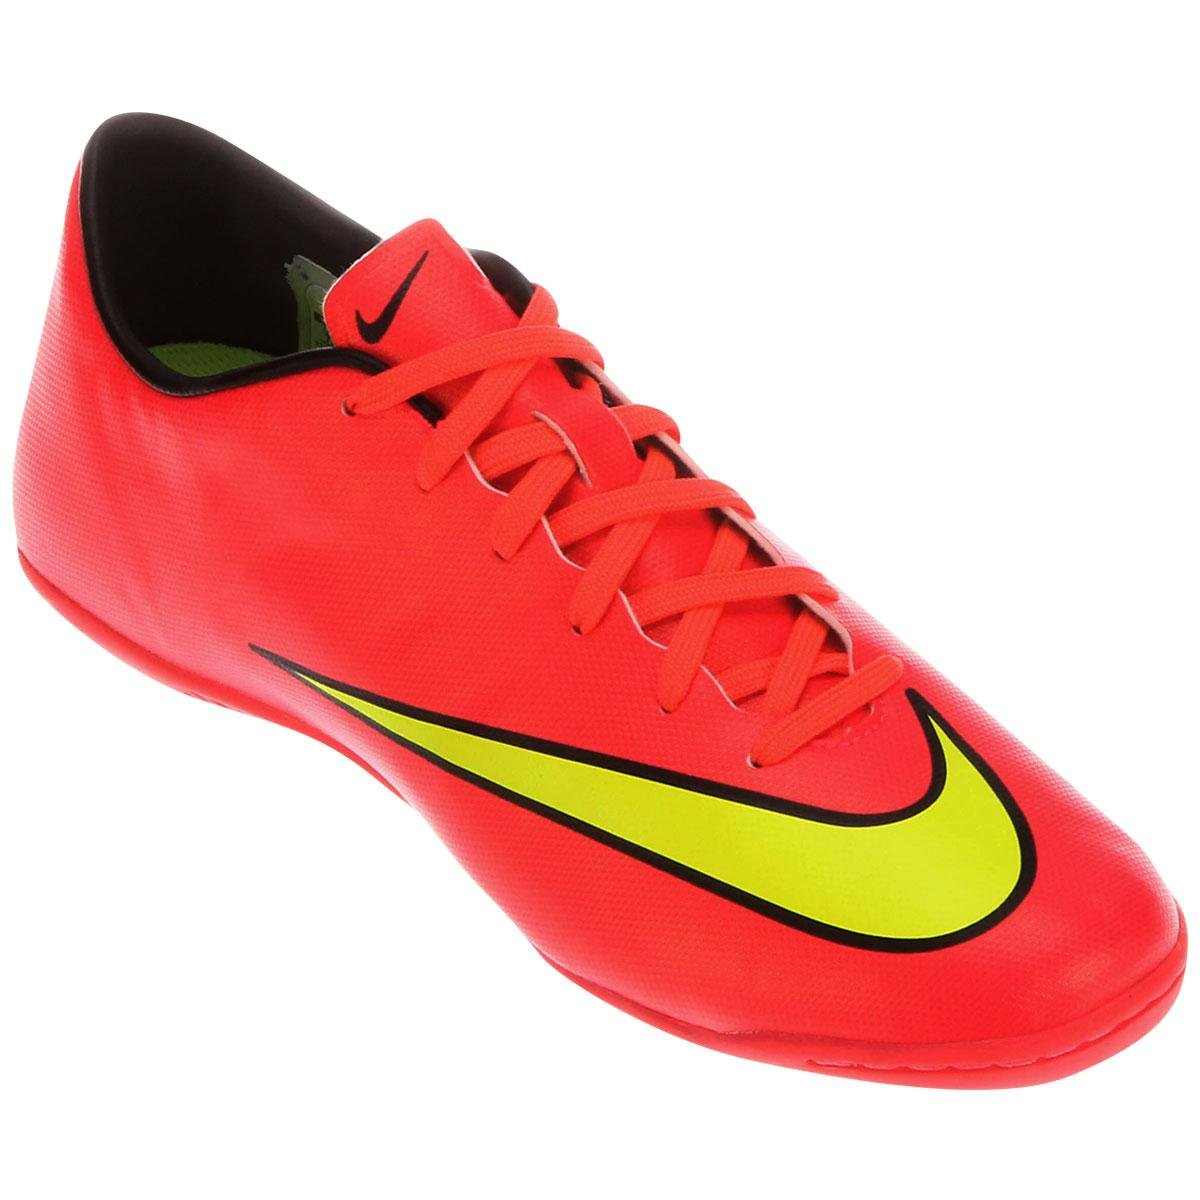 ... d5b9779eae0 Chuteira Futsal Nike Mercurial Victory 5 IC Masculina -  Compre Agora Netshoes ... 6081ef6ee221f